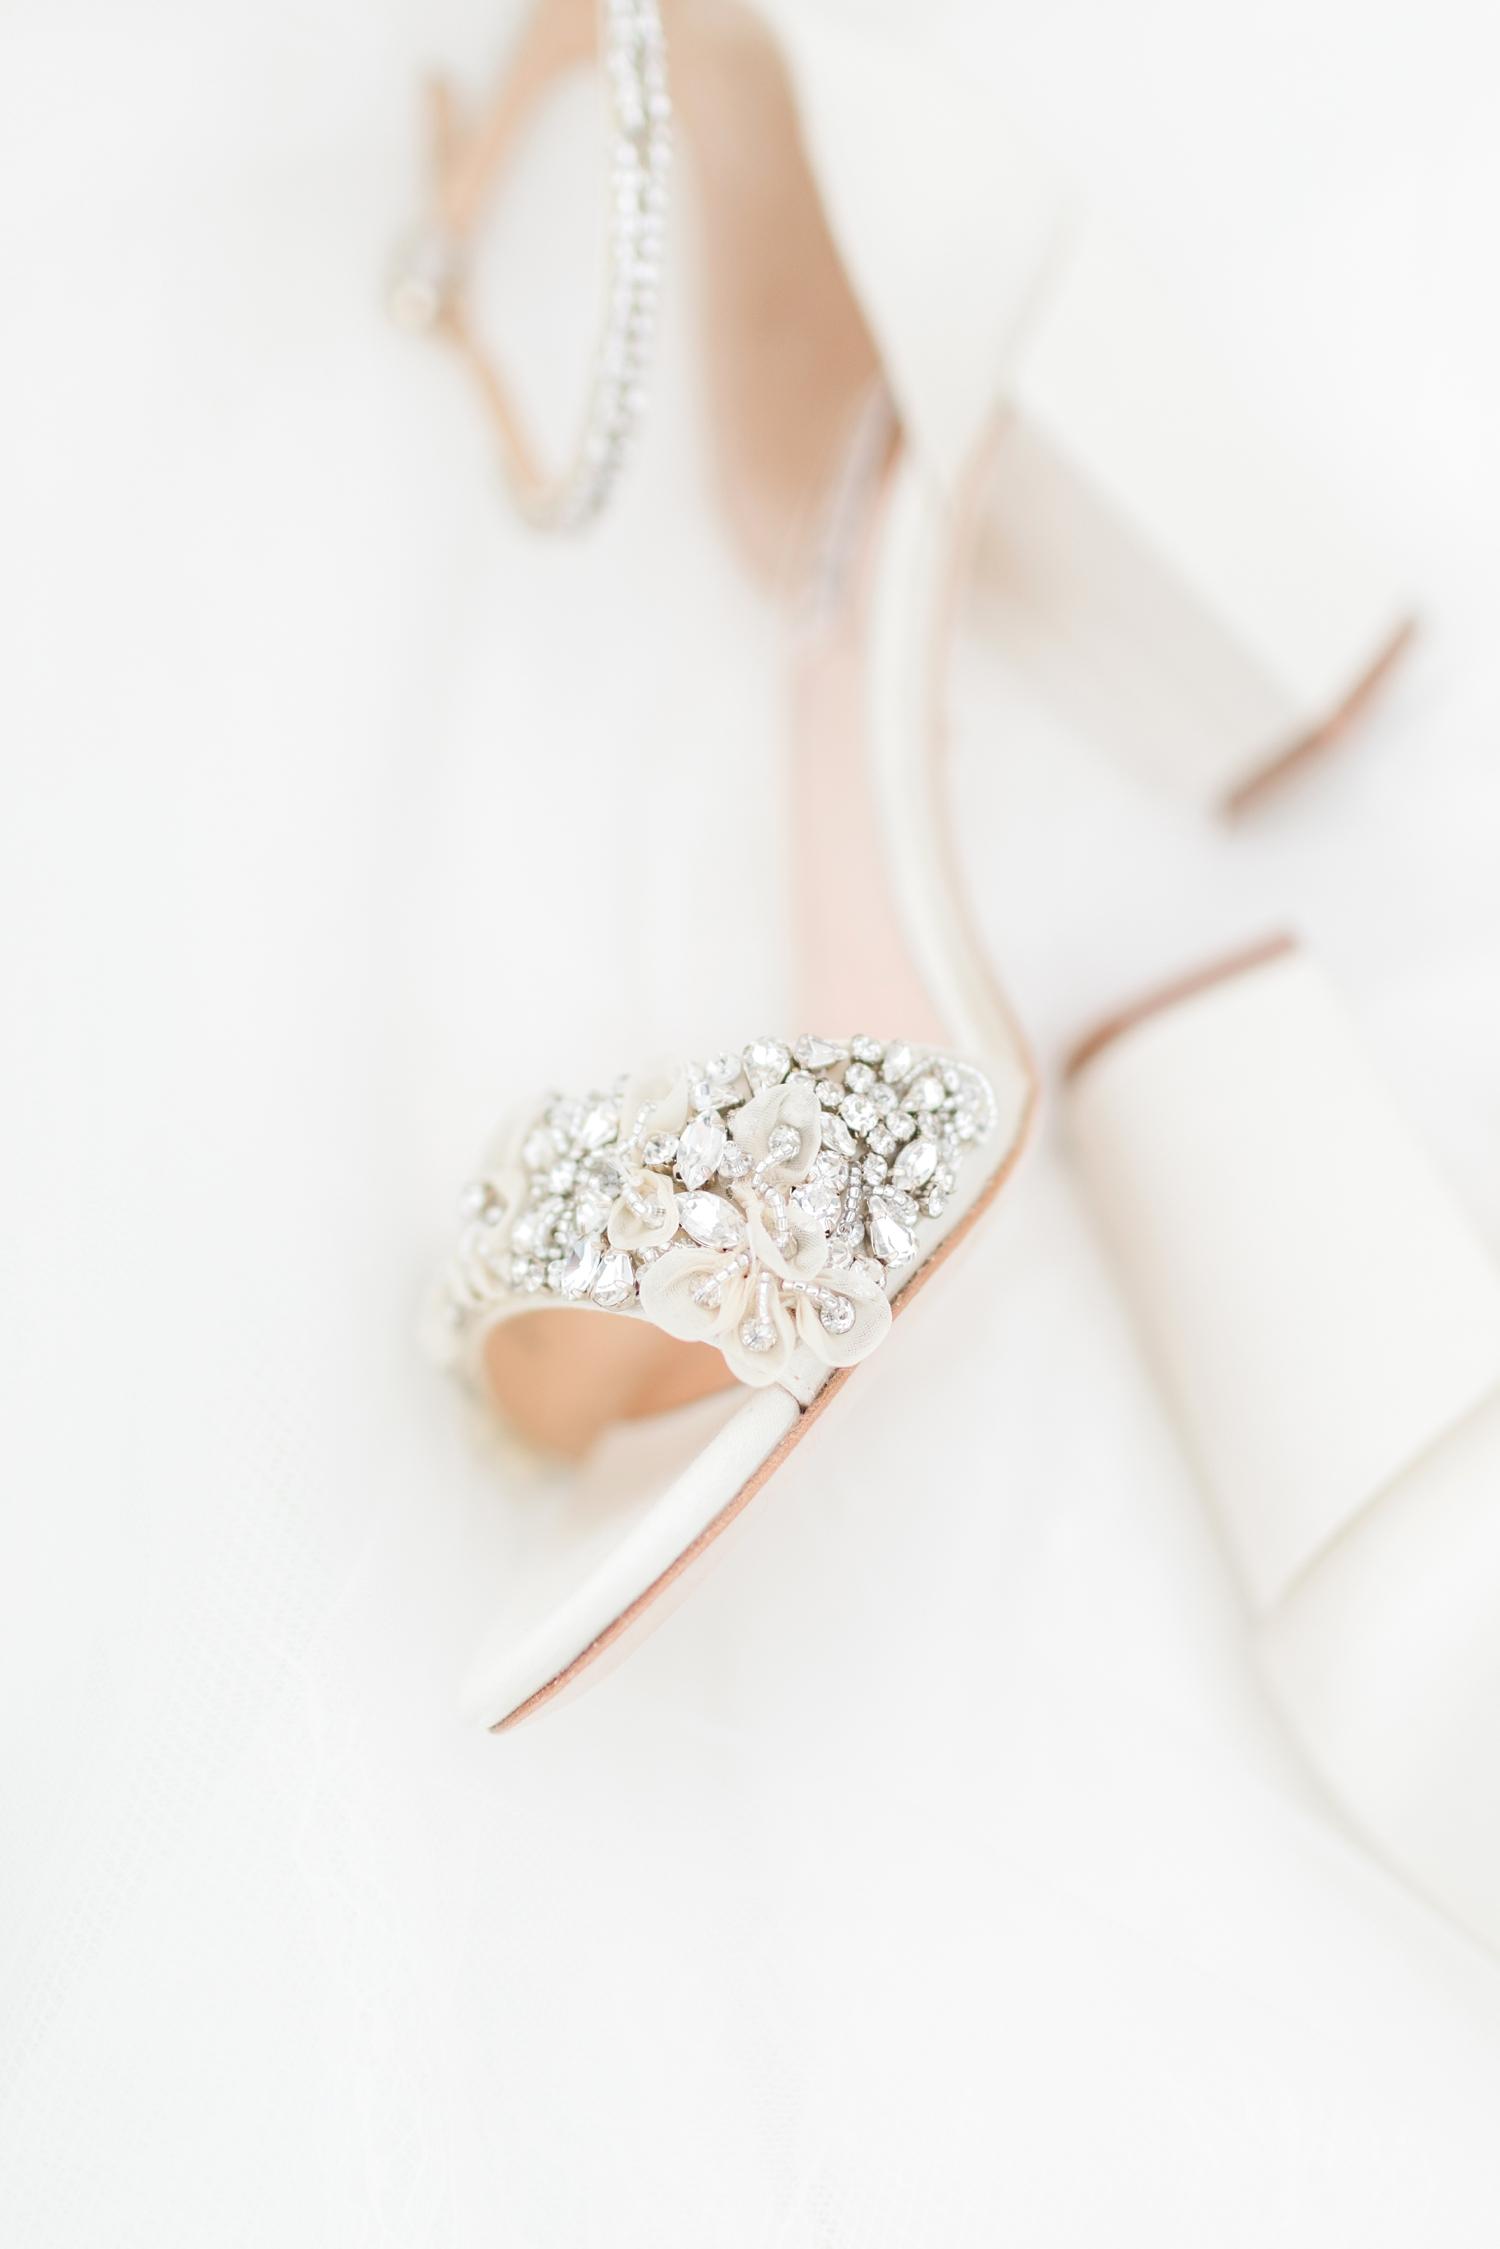 Schindler WEDDING HIGHLIGHTS-32_Herrington-on-the-Bay-wedding-Maryland-wedding-photographer-anna-grace-photography-photo.jpg